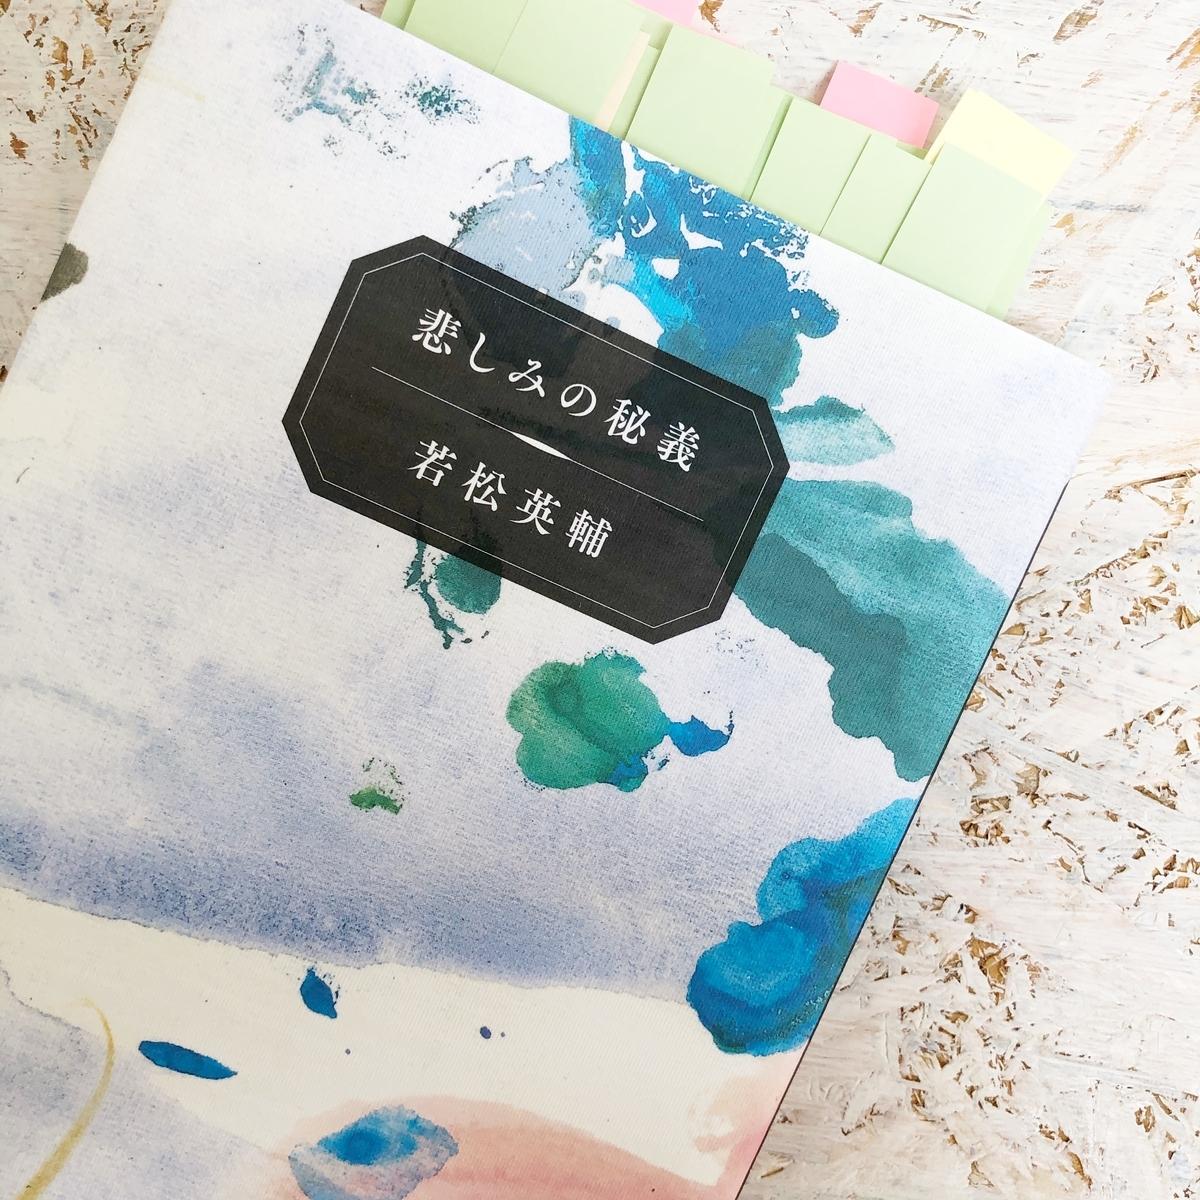 f:id:miyuki_sato:20201022161521j:plain